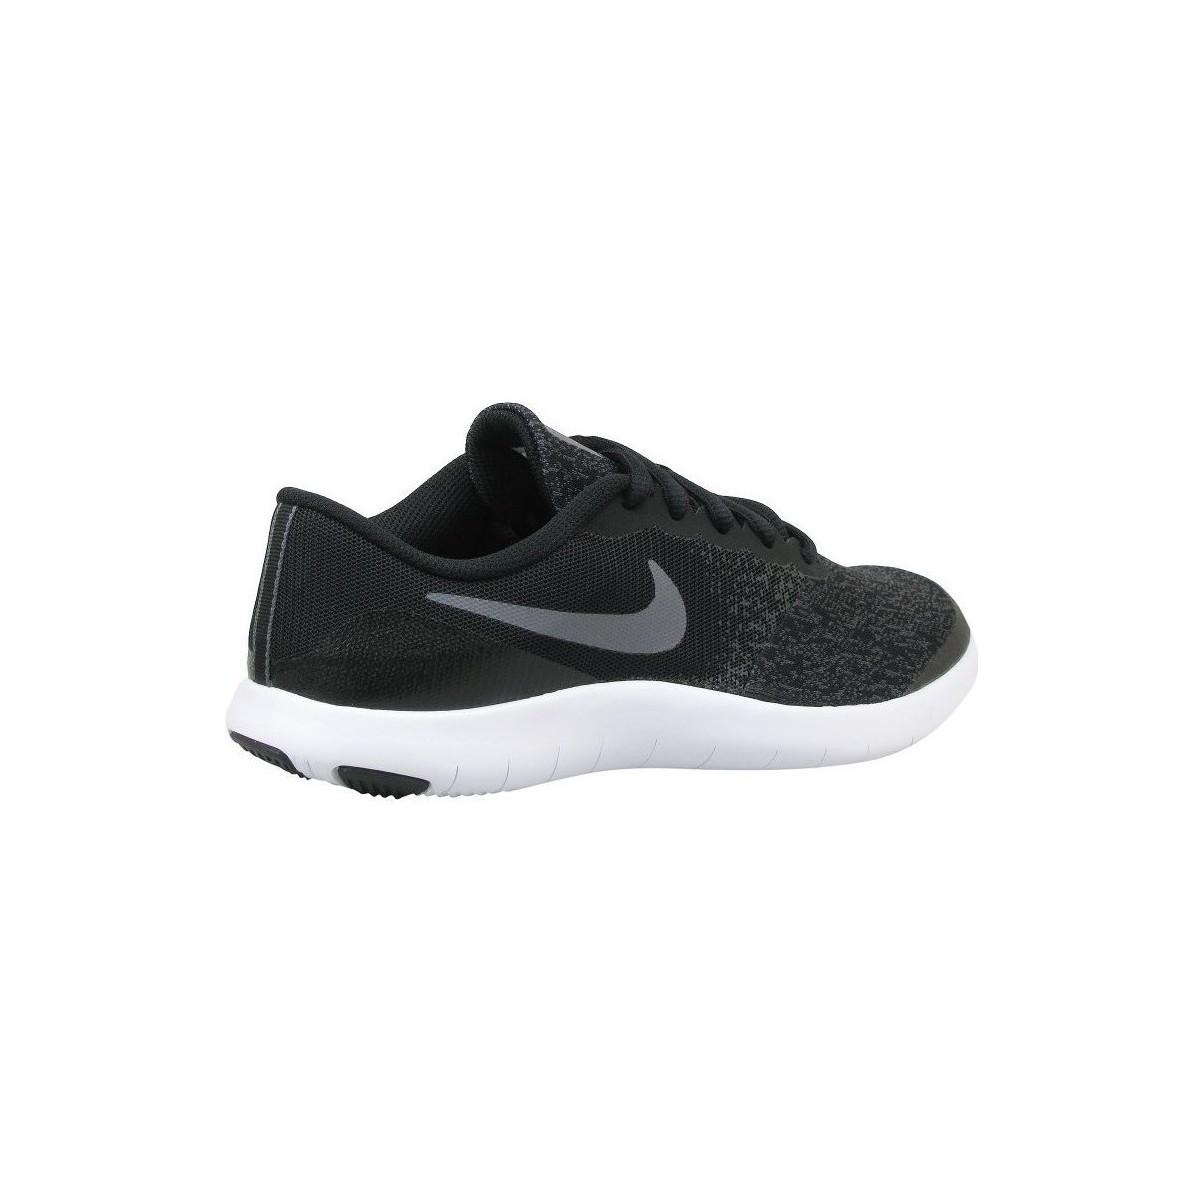 Sneakers Nike  Flex Contact GS